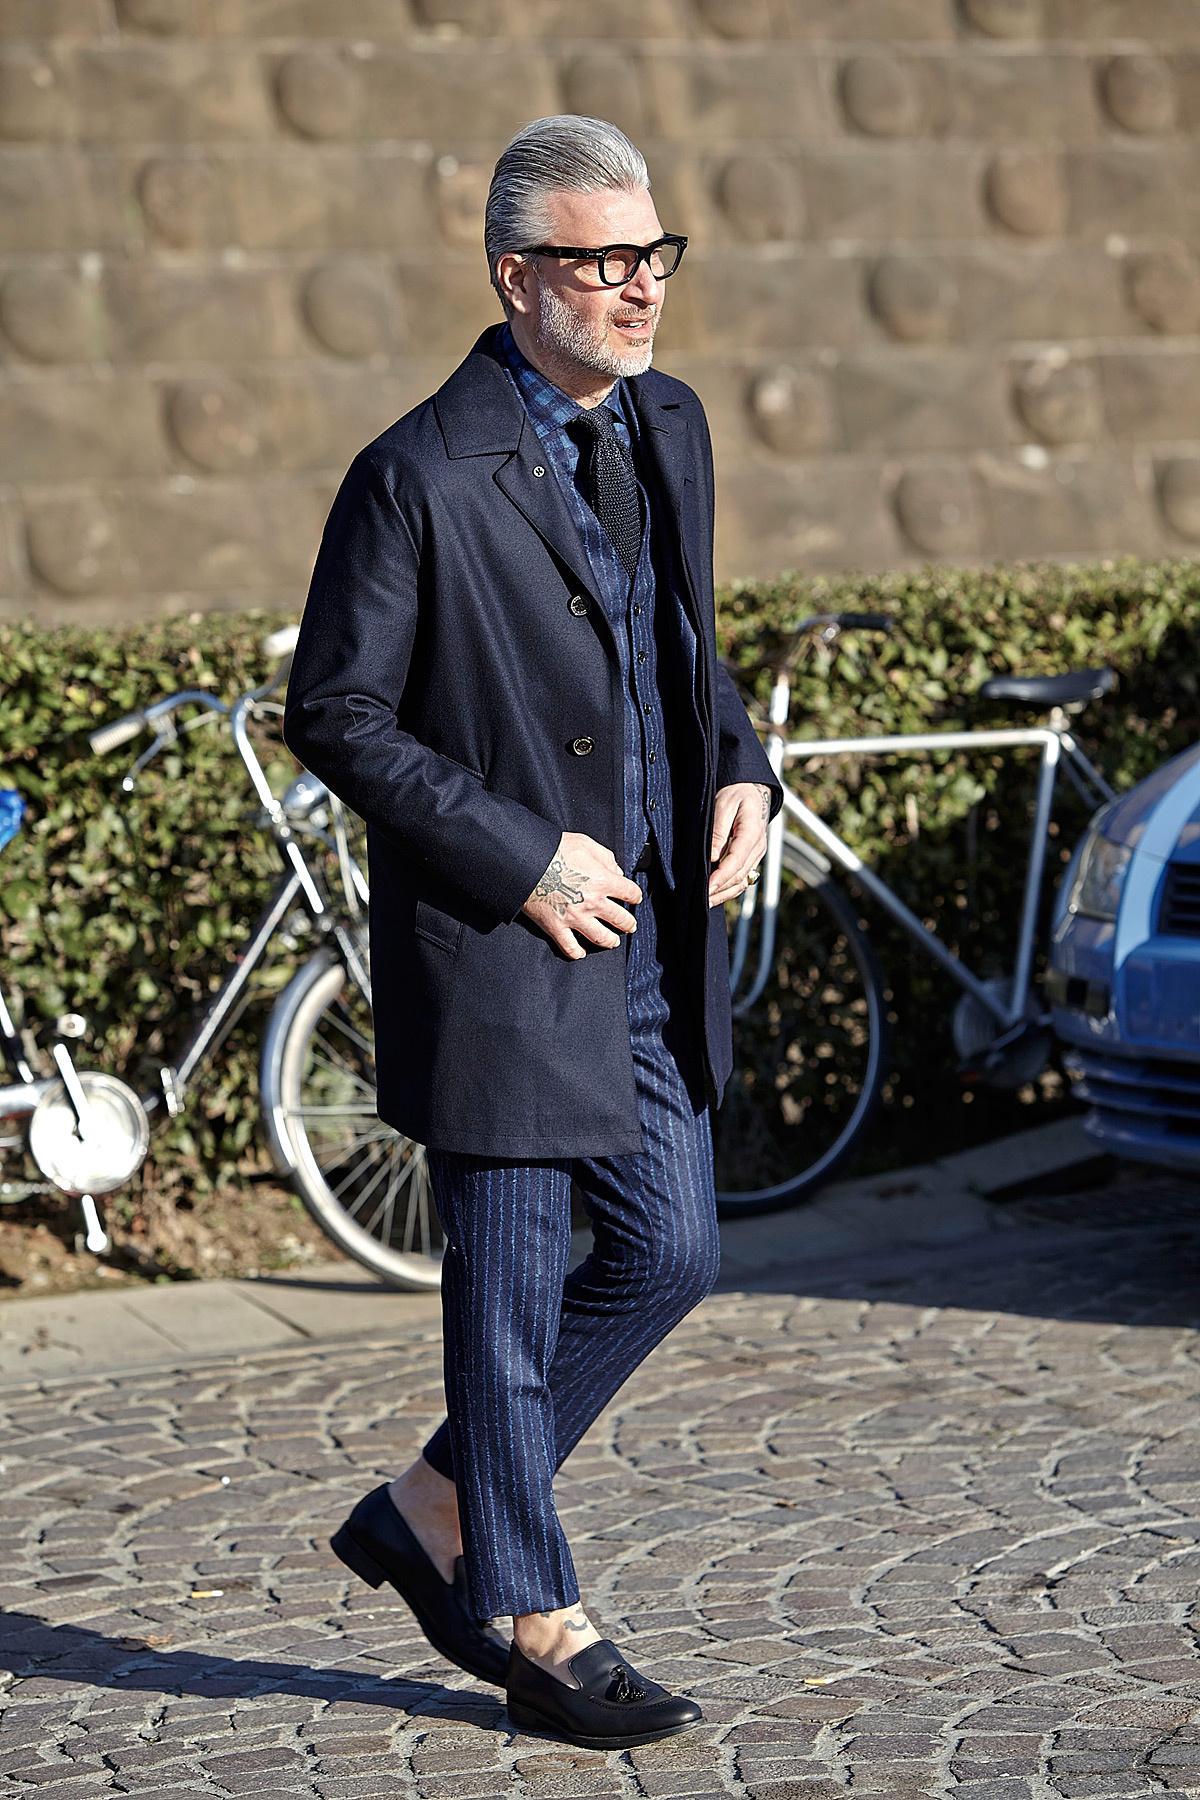 Black dress navy blazer - Wear A Navy Blue Overcoat And Navy Blue Suit Pants Like A True Gent If Navy Plaid Dress Shirt Black